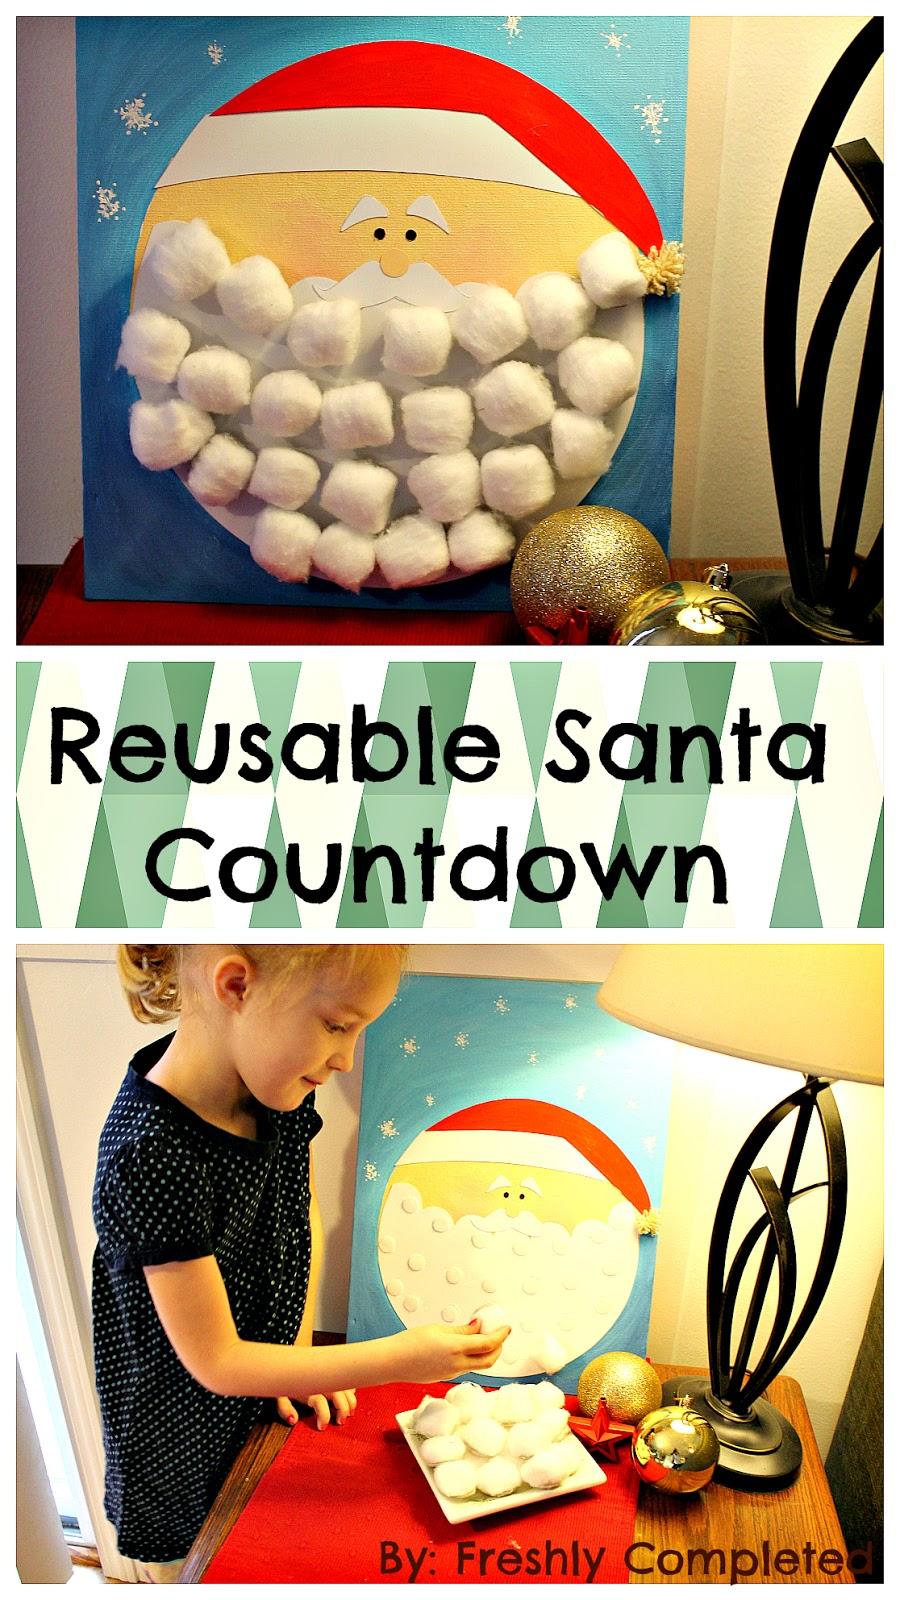 Freshly Completed: Reusable Cotton-ball Santa Countdown